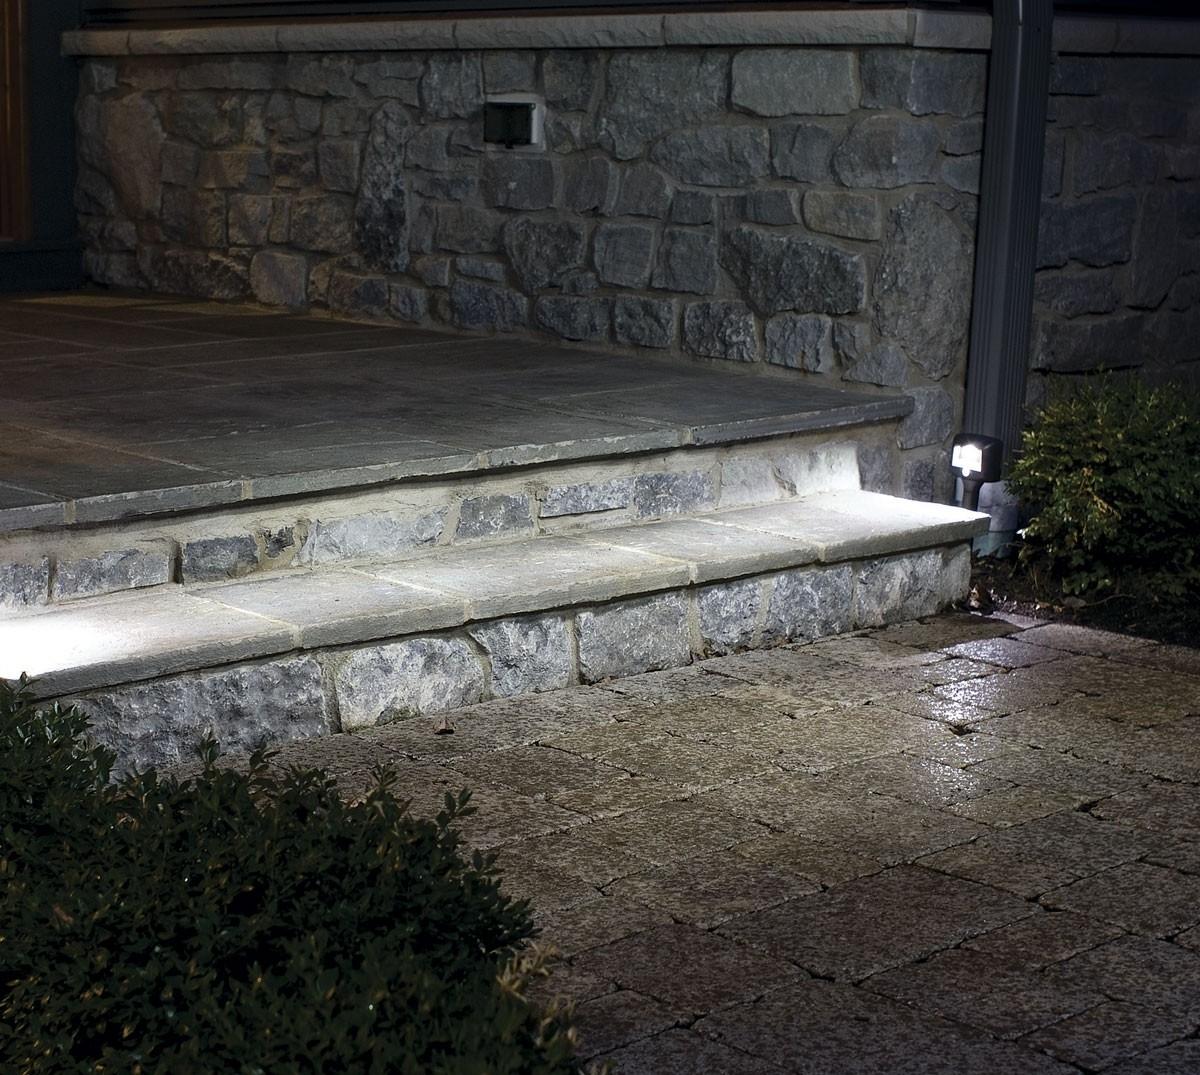 Driveway Motion Sensor Lights | Mr Beams Mb572 regarding Outdoor Driveway Lanterns (Image 4 of 20)